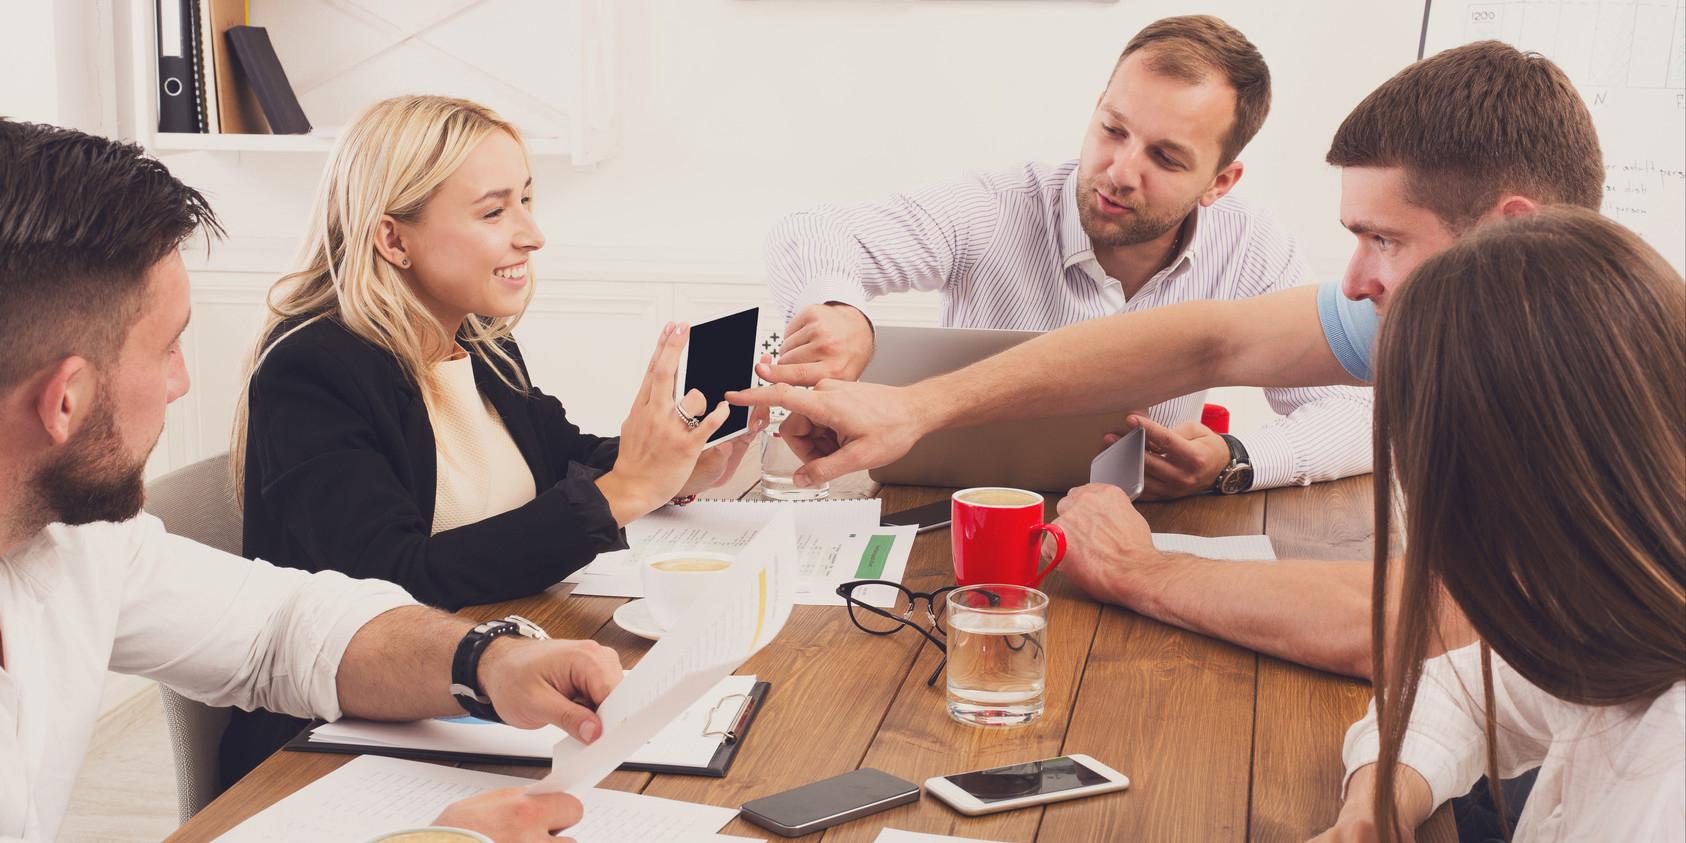 matchmaking möteDating Jungfrun man tips